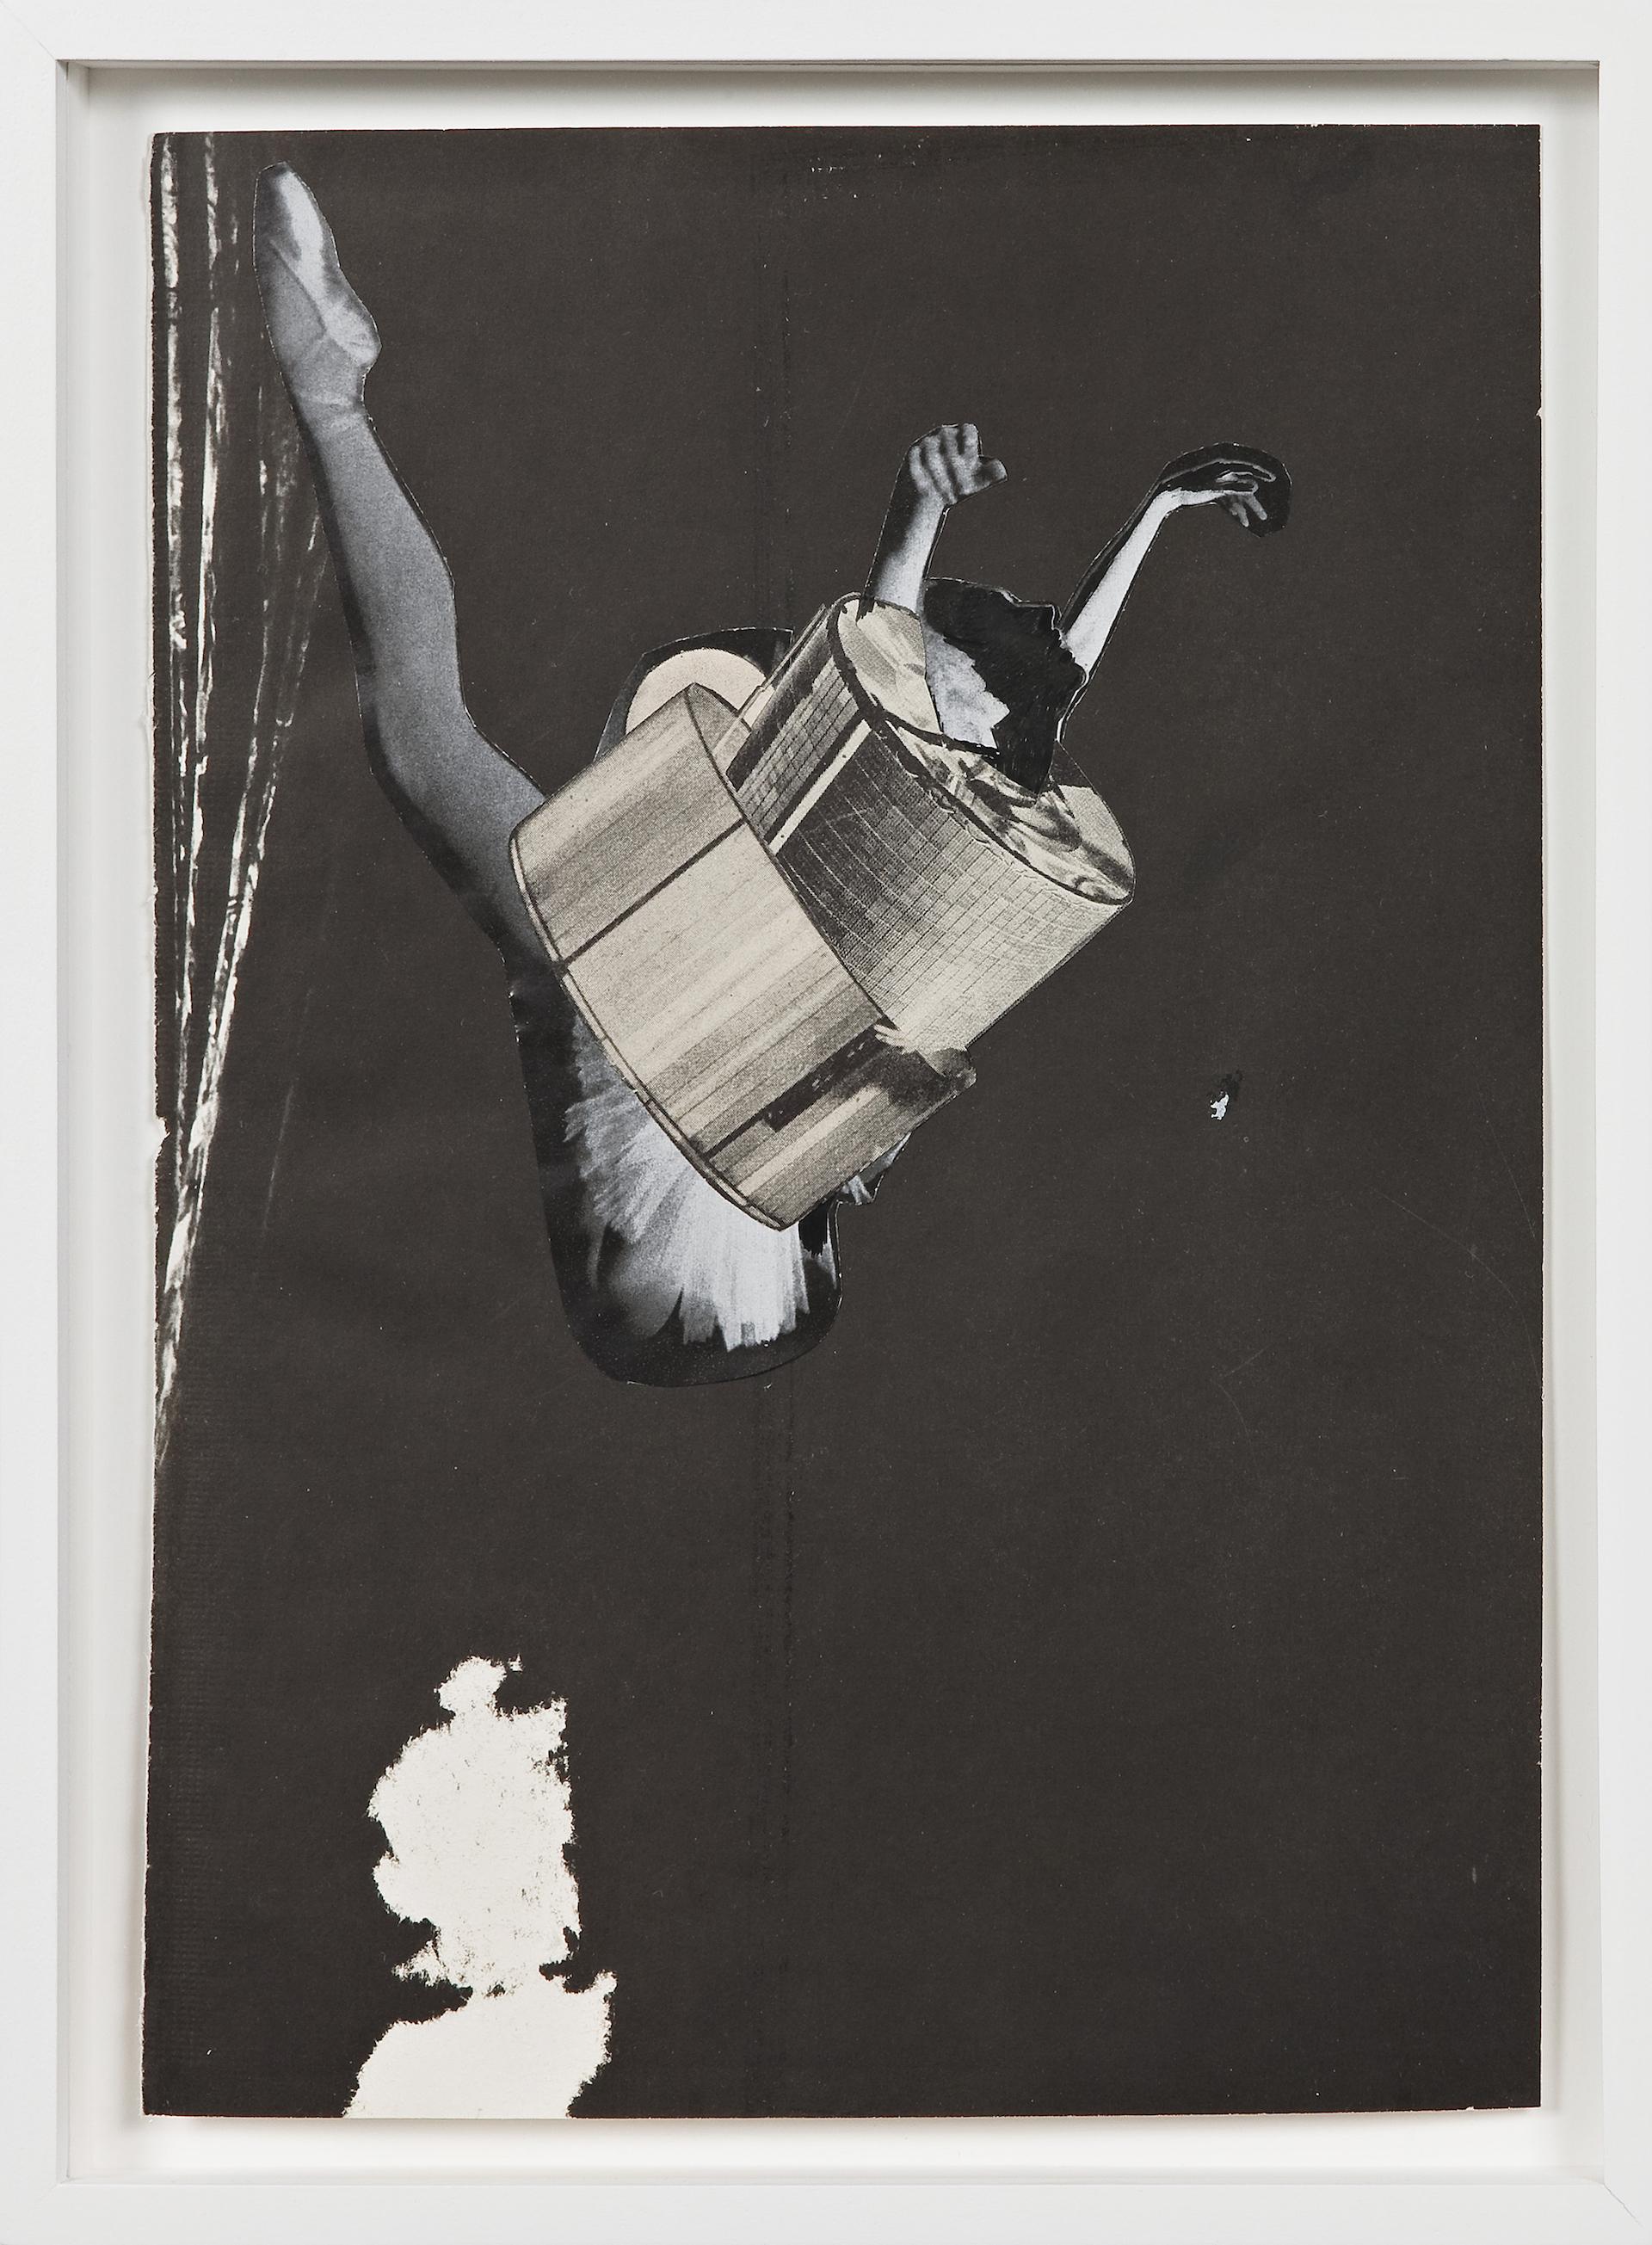 Petals, Sepals, Metals, 2009, collage and ink on paper, 21,5 x 29 cm